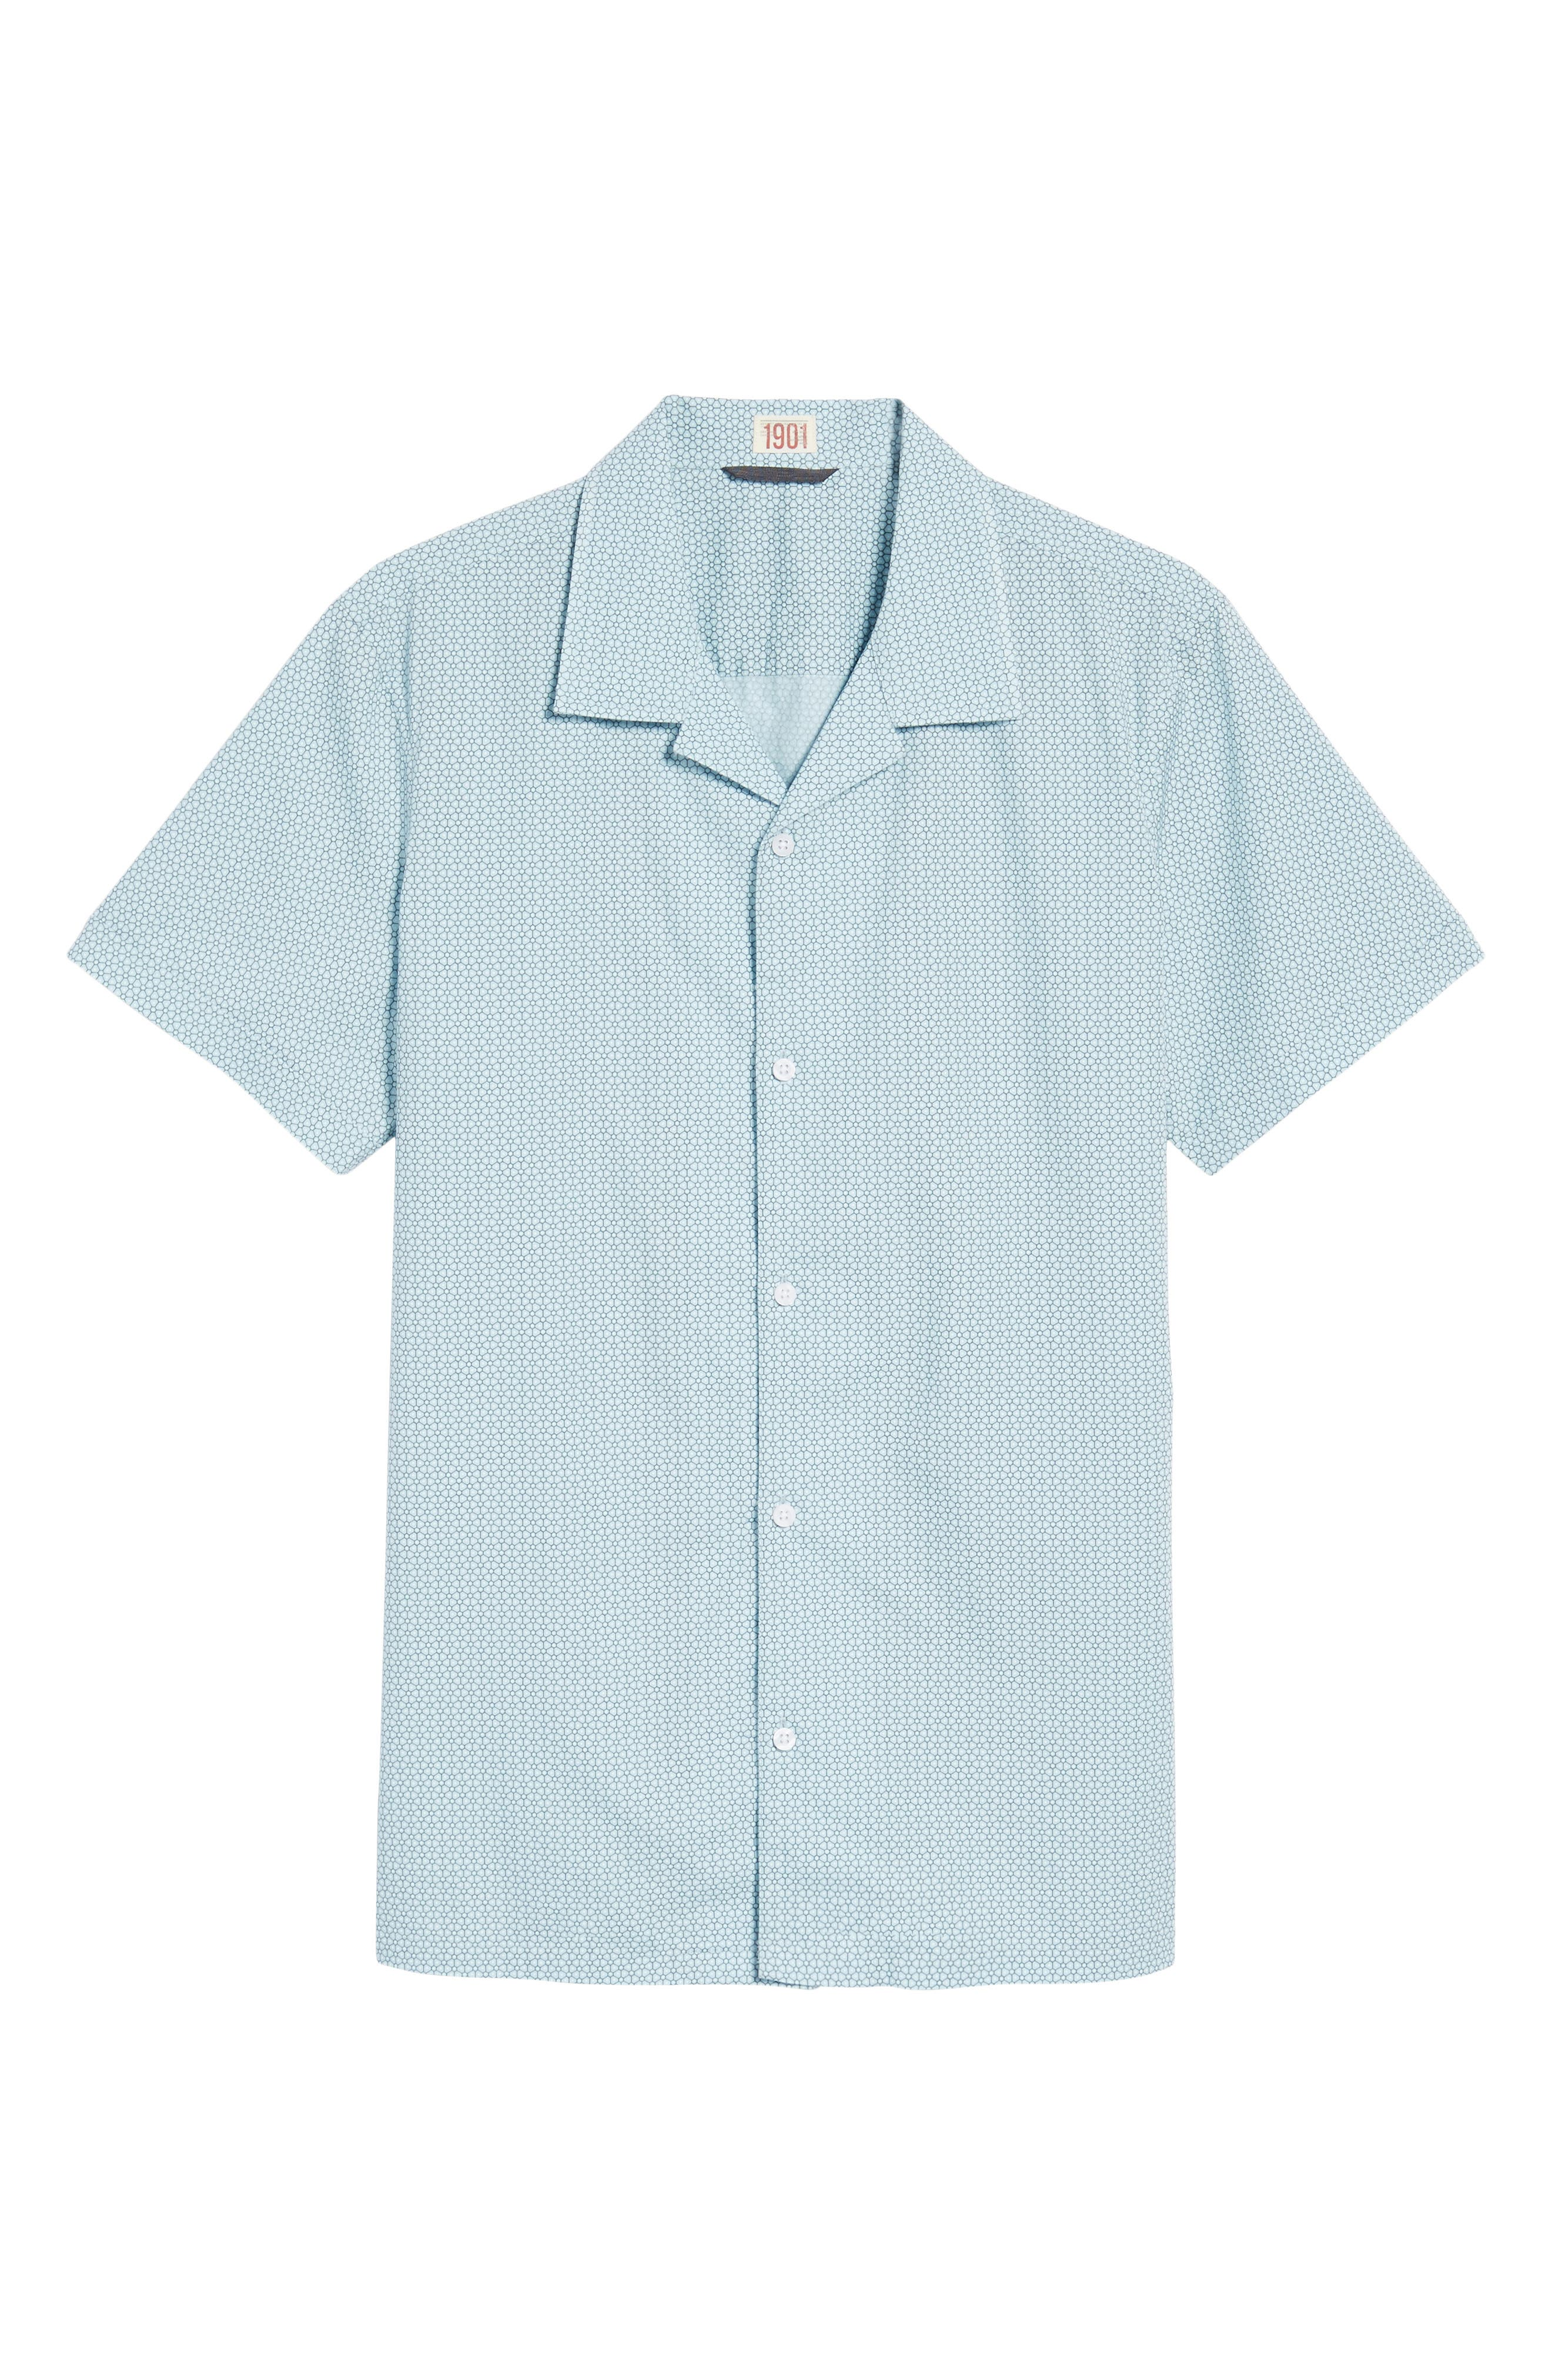 Trim Fit Stretch Geometric Camp Shirt,                             Alternate thumbnail 6, color,                             450